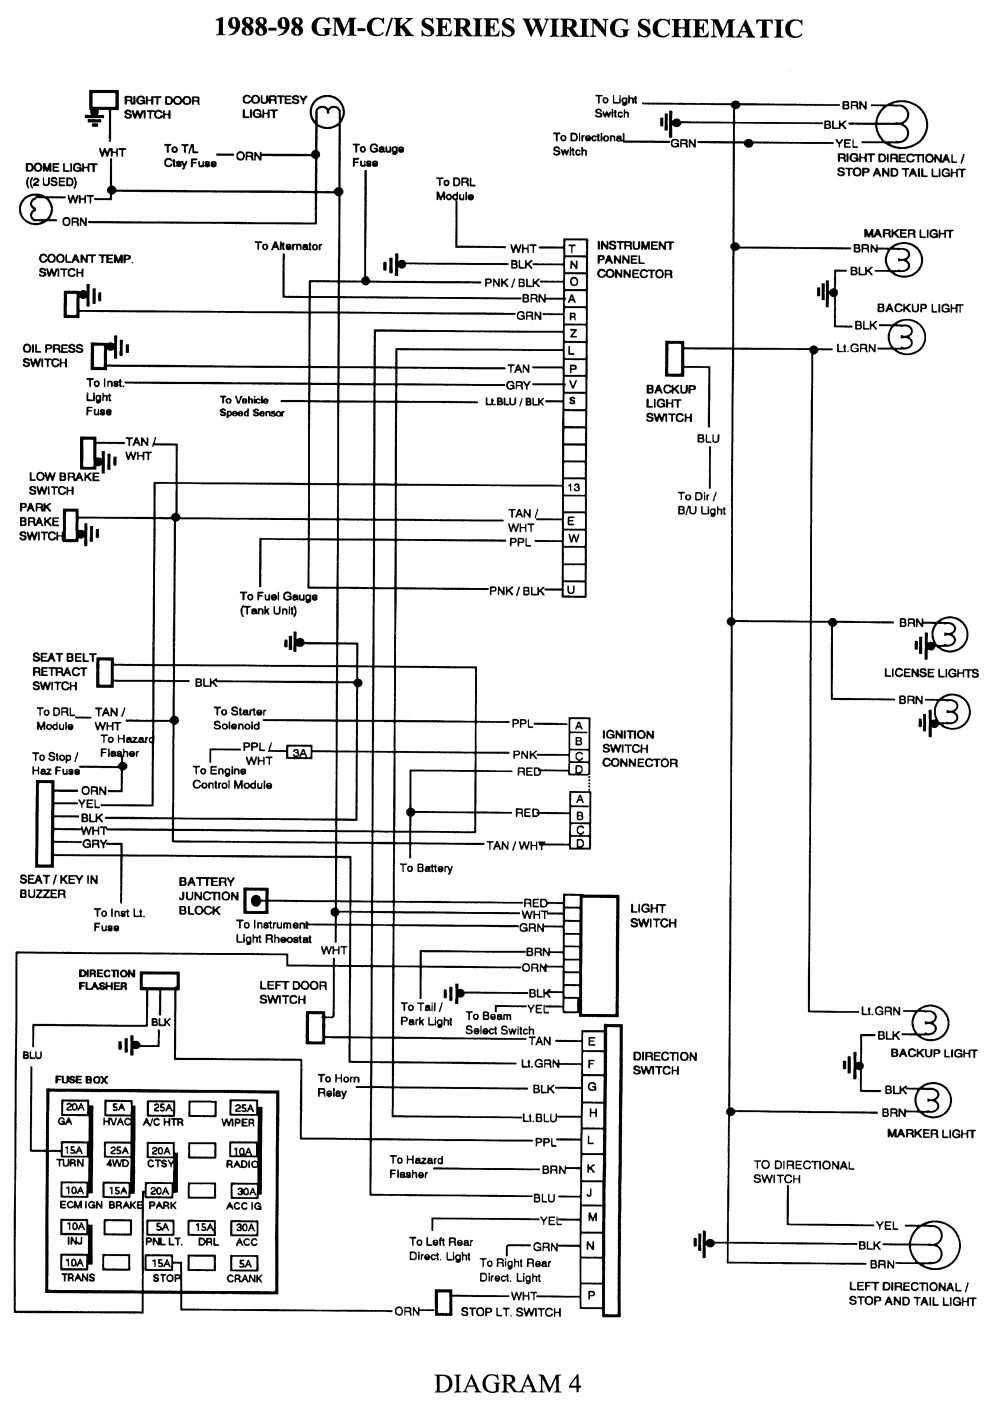 hight resolution of 2006 silverado light wiring diagram wiring diagram schematics 2003 impala tail light wiring diagram 03 silverado